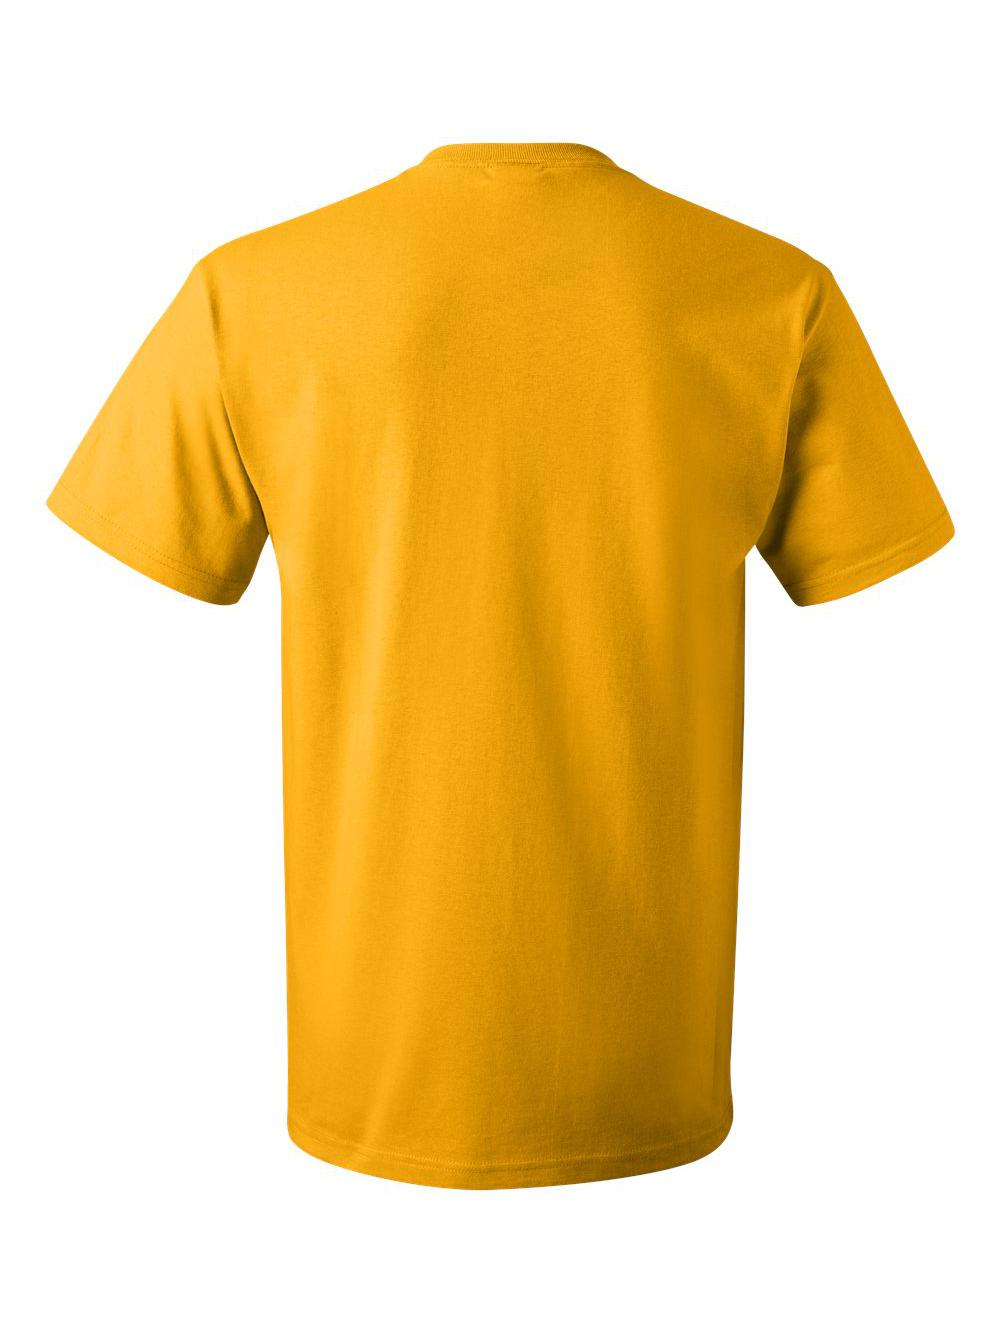 Fruit-of-the-Loom-HD-Cotton-Short-Sleeve-T-Shirt-3930R thumbnail 58